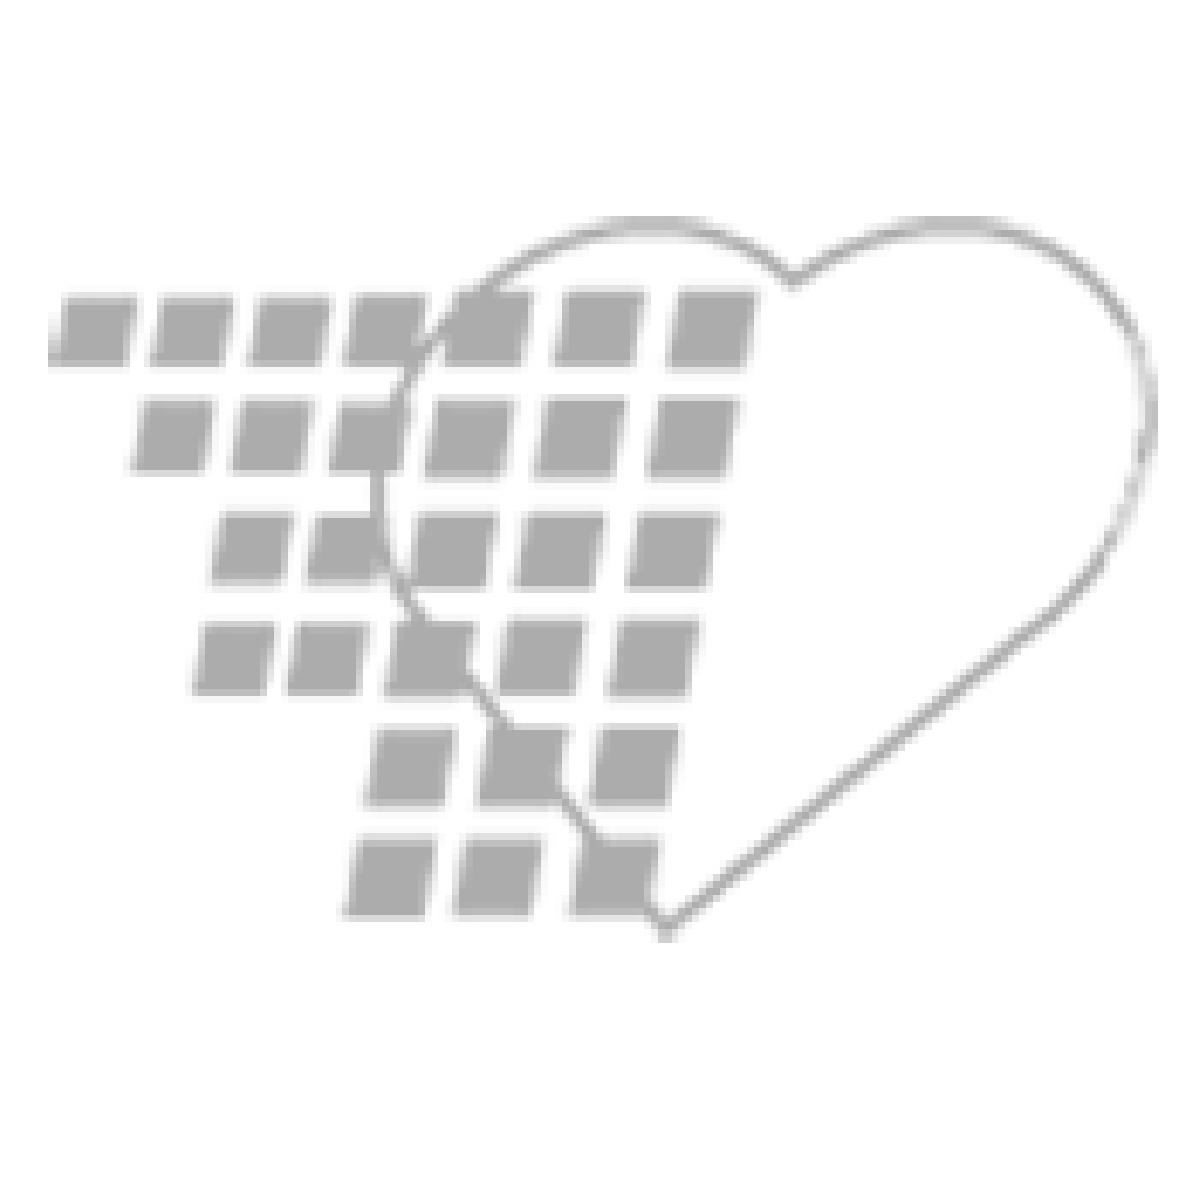 06-93-0055 - Demo Dose® Capotn 25 mg - 100 Pills/Box